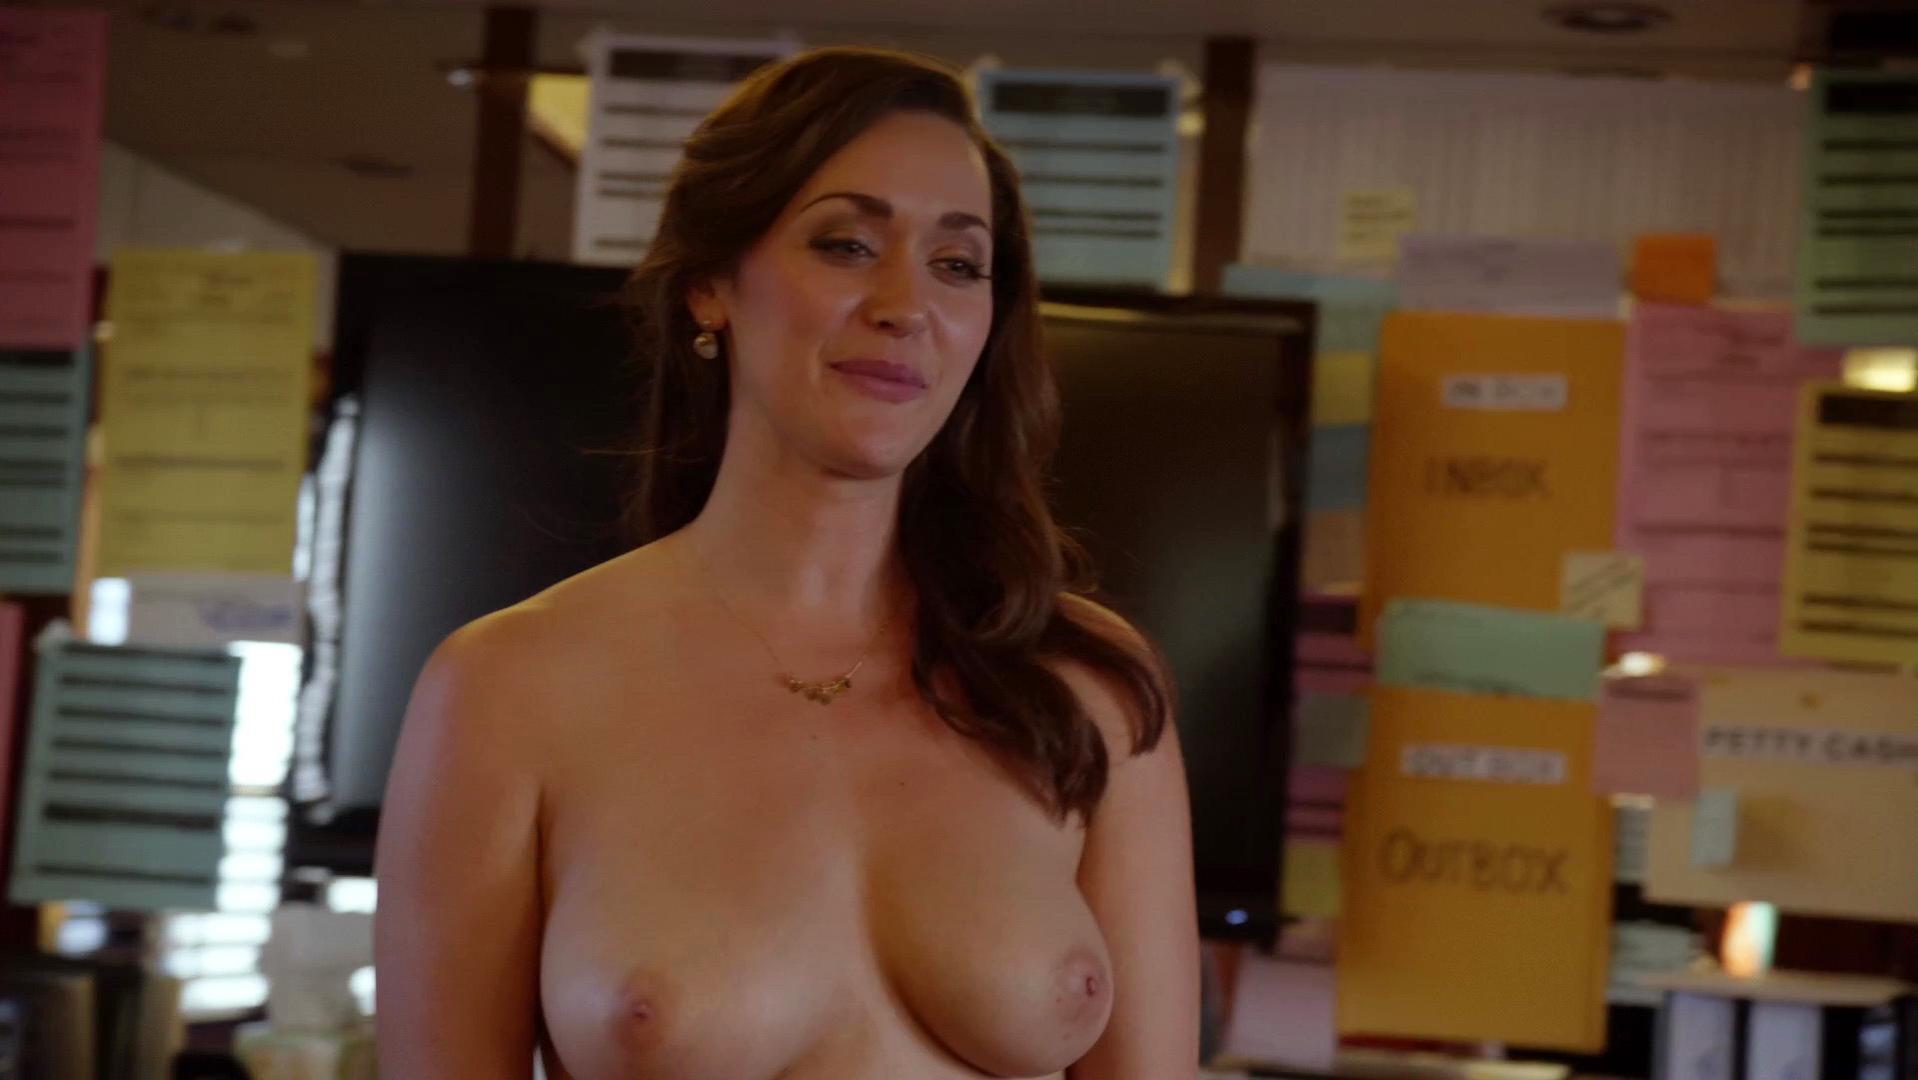 Nude Video Celebs  Sarah Power Nude - Californication -7302